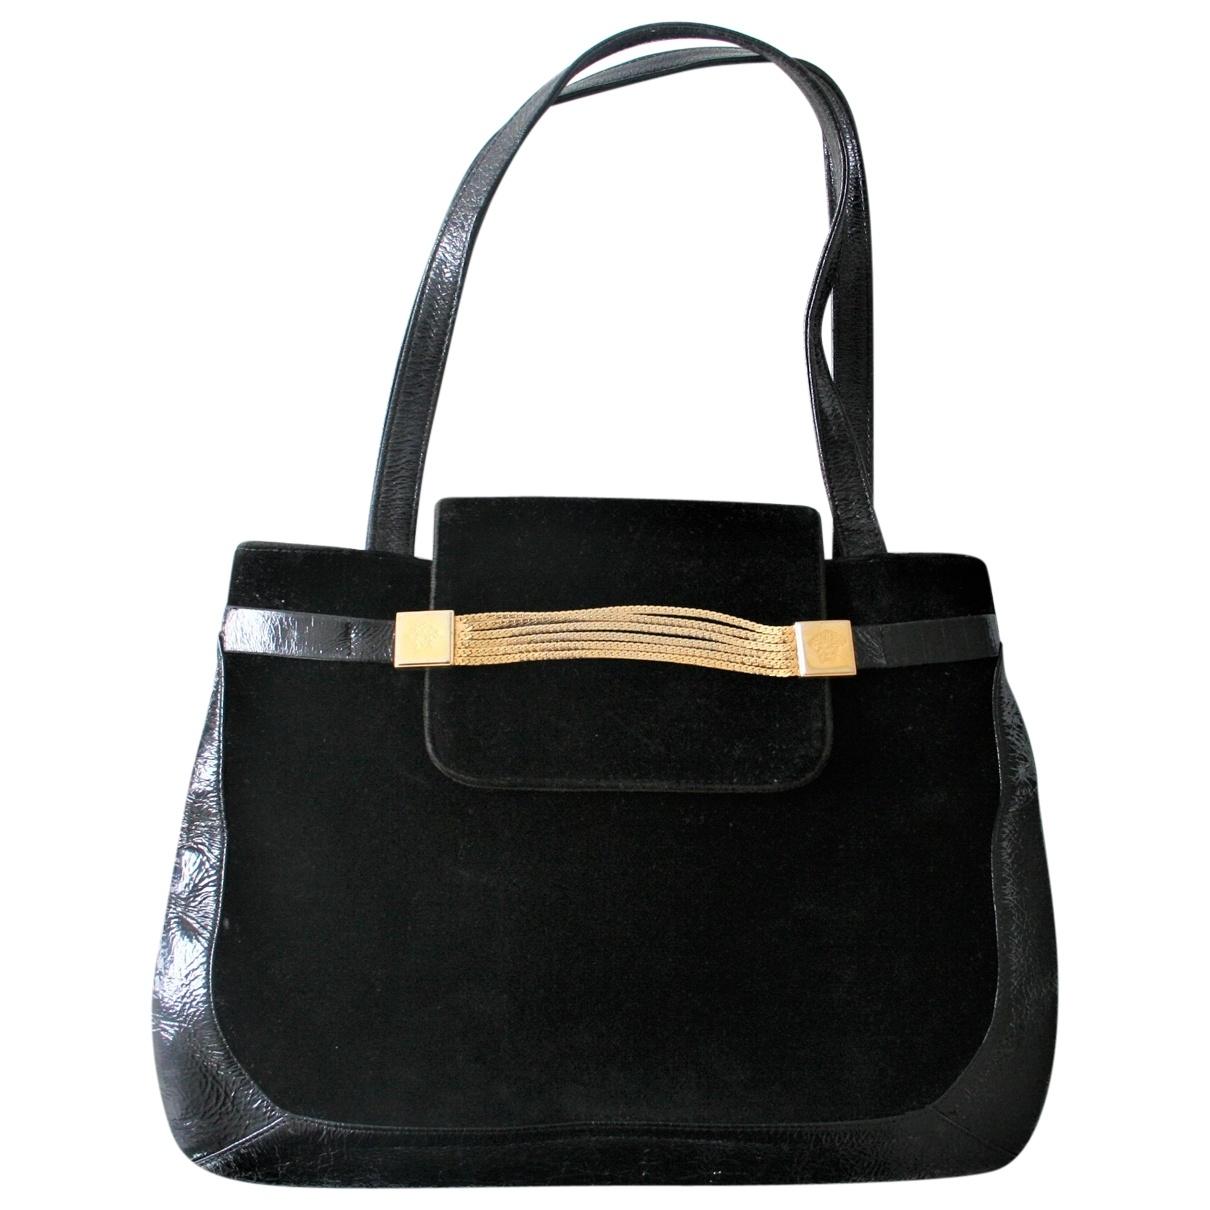 Gianni Versace \N Handtasche in  Schwarz Veloursleder